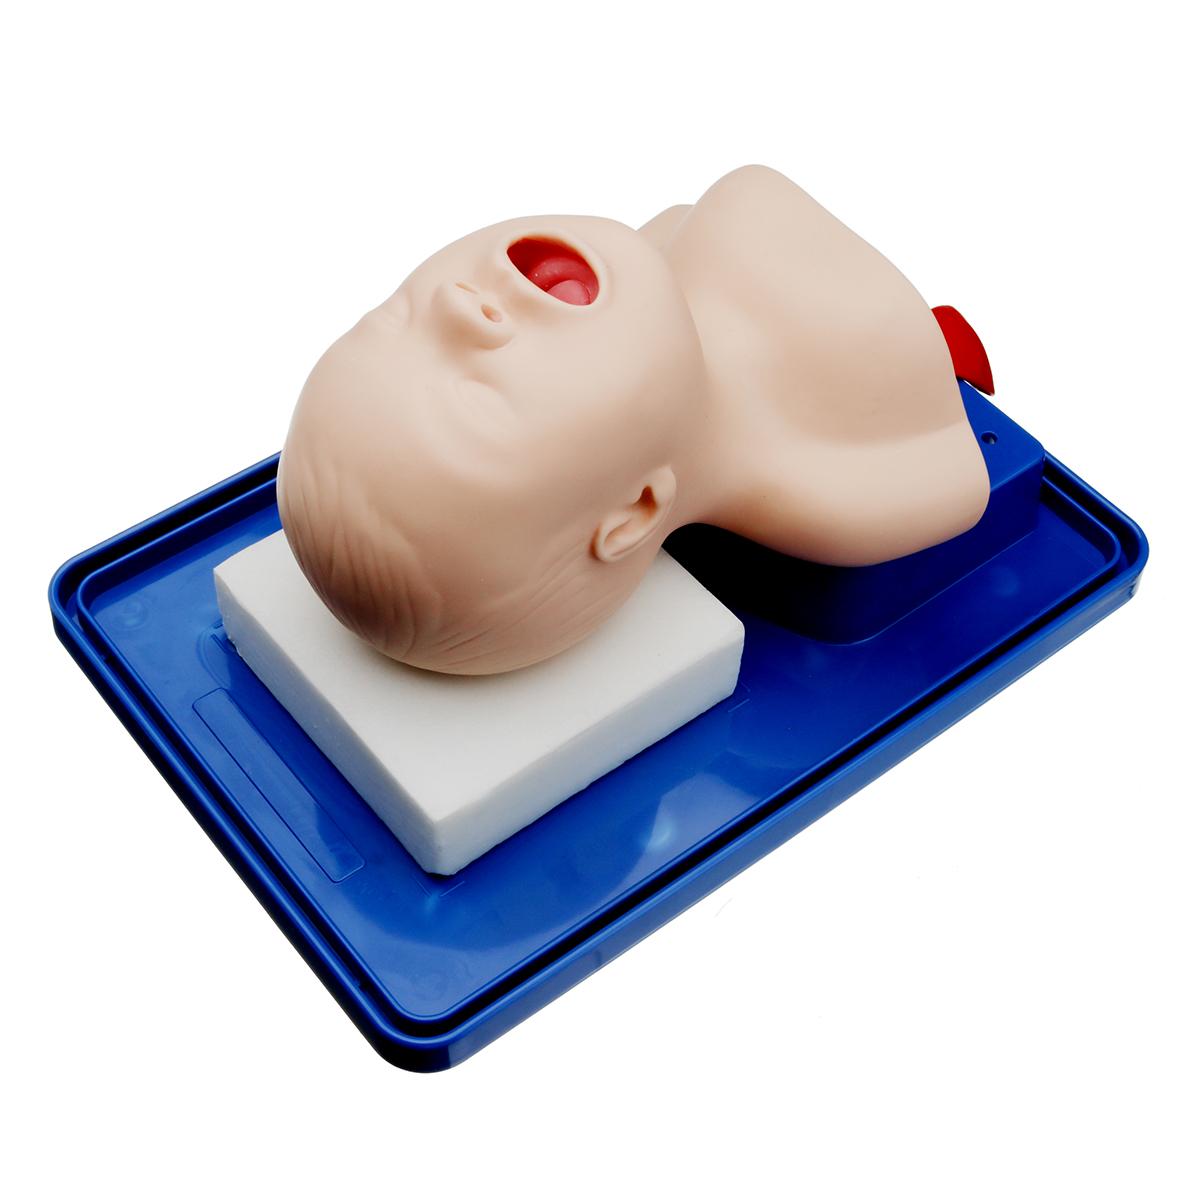 Intubation Manikin Study Teaching Model Baby Infant Airway Management Trainer Medical Model 31